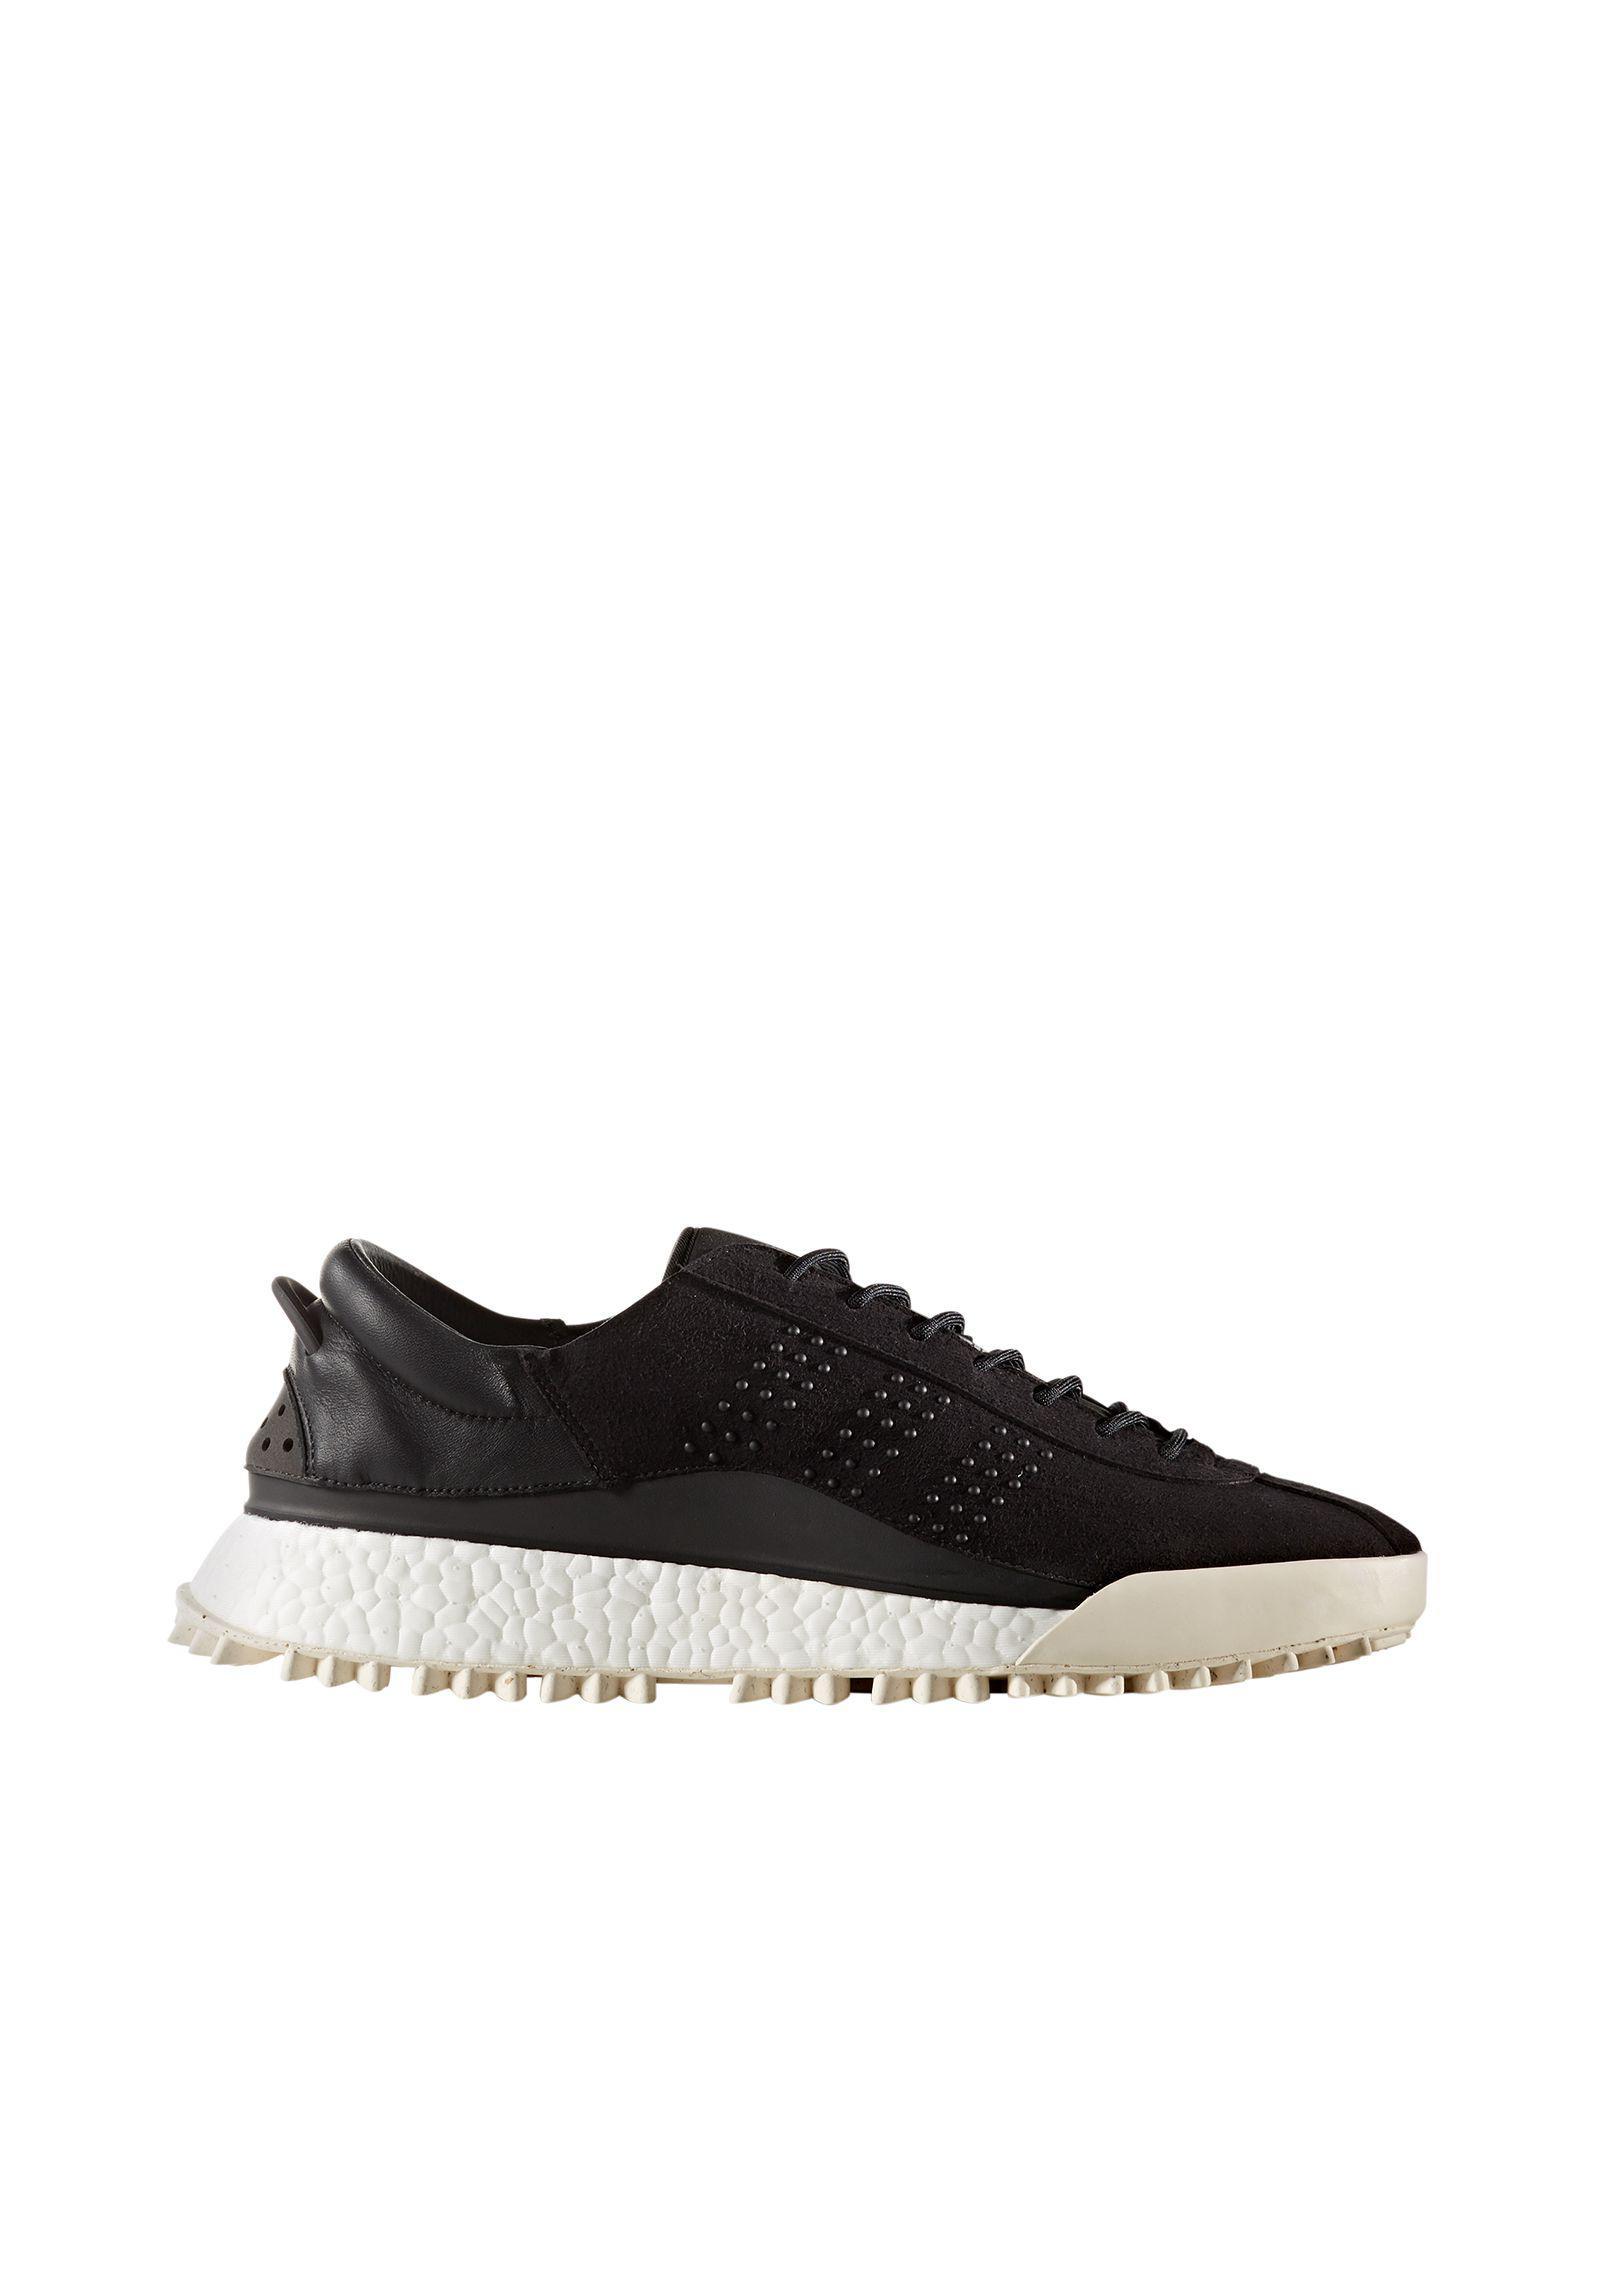 849a8518266e36 Gallery. Men s Adidas Tubular Doom Primeknit Men s Walking Shoes Men s  Adidas Originals ...